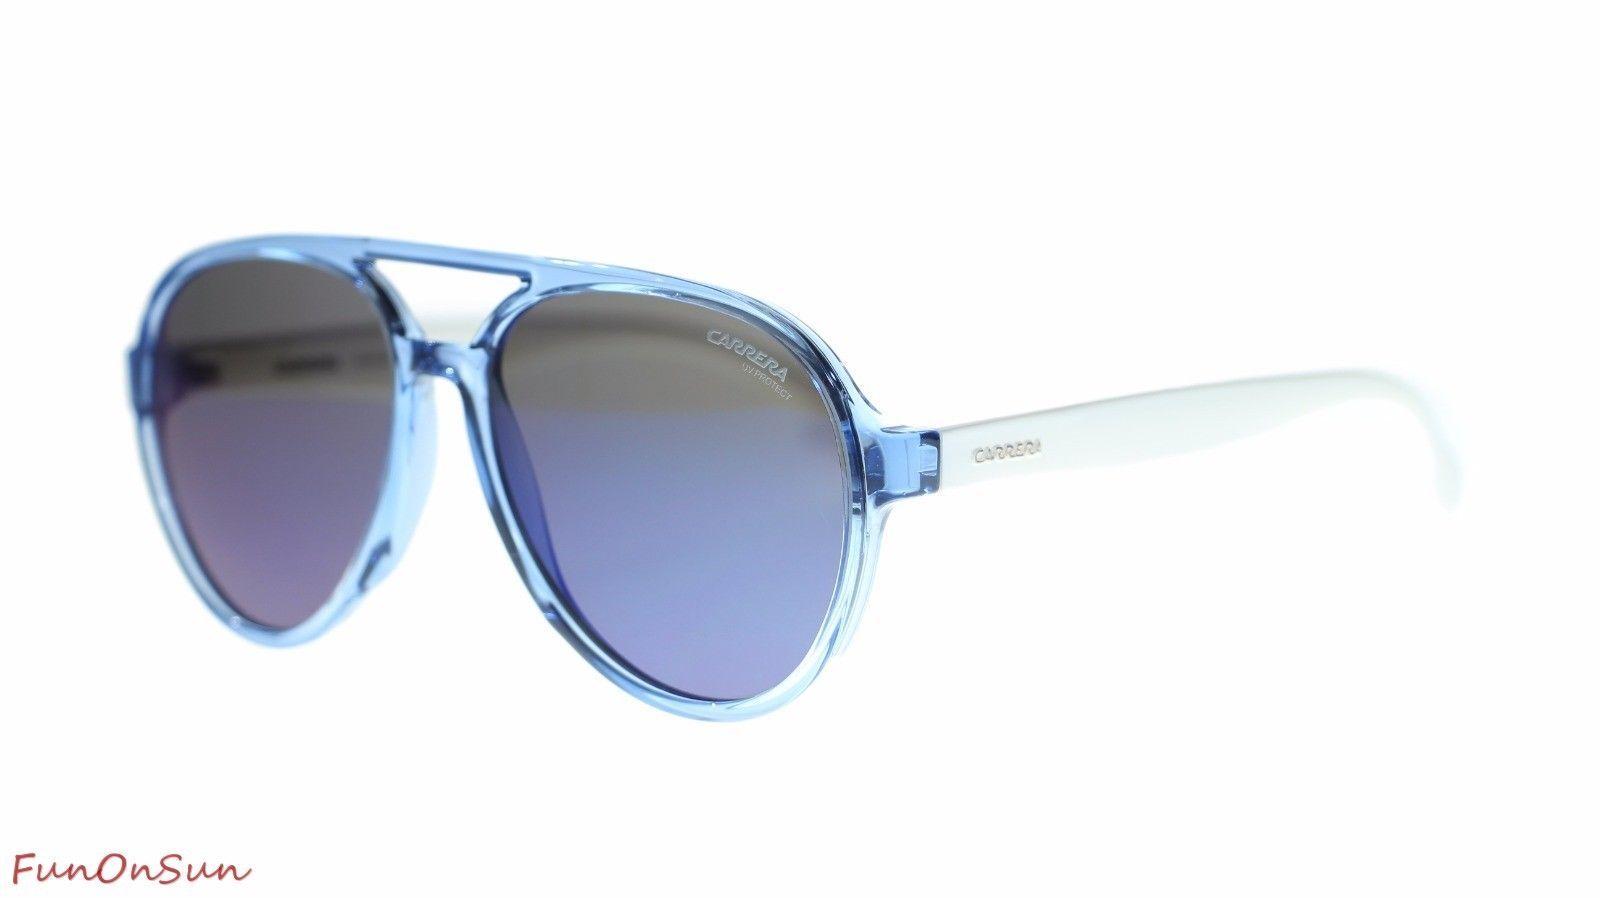 acbe2b2ba9d9f9 Carrerino 22 S 0PJP Aviator Kids Sunglasses Blue Blue Sky Mirror Lens 51mm  -  82.45